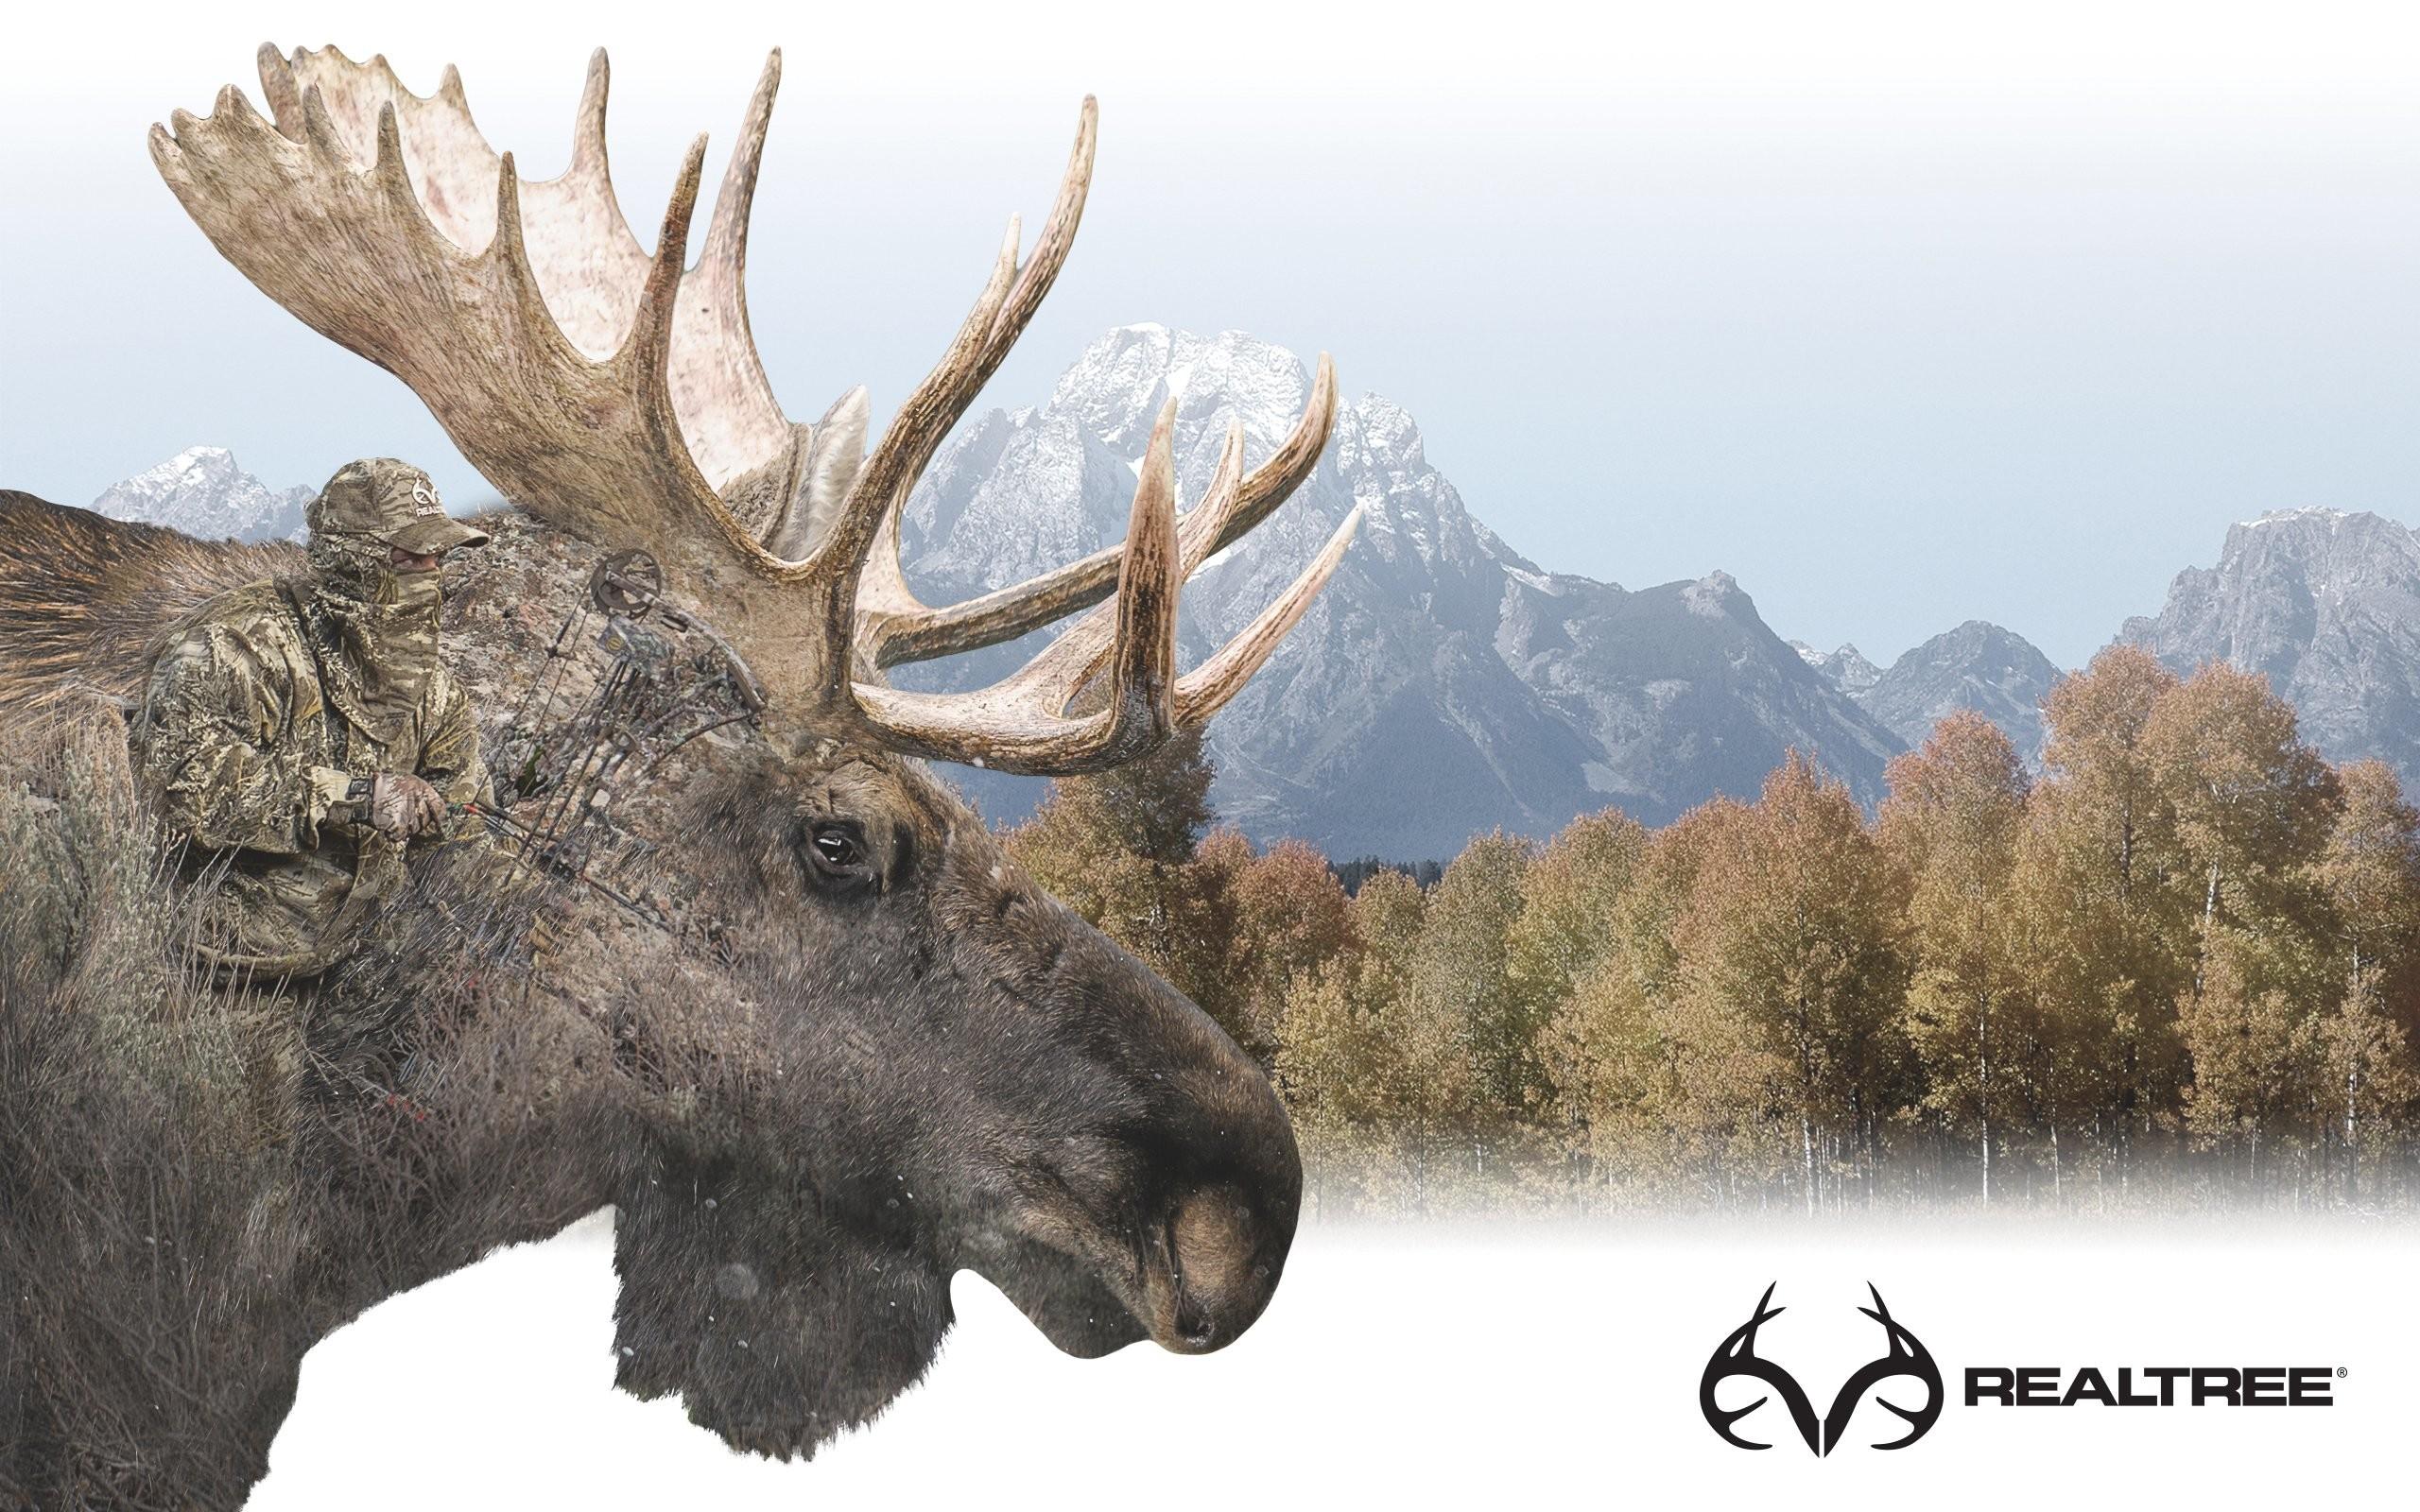 Realtree Wallpaper For Computer: Realtree Deer Wallpaper ·①